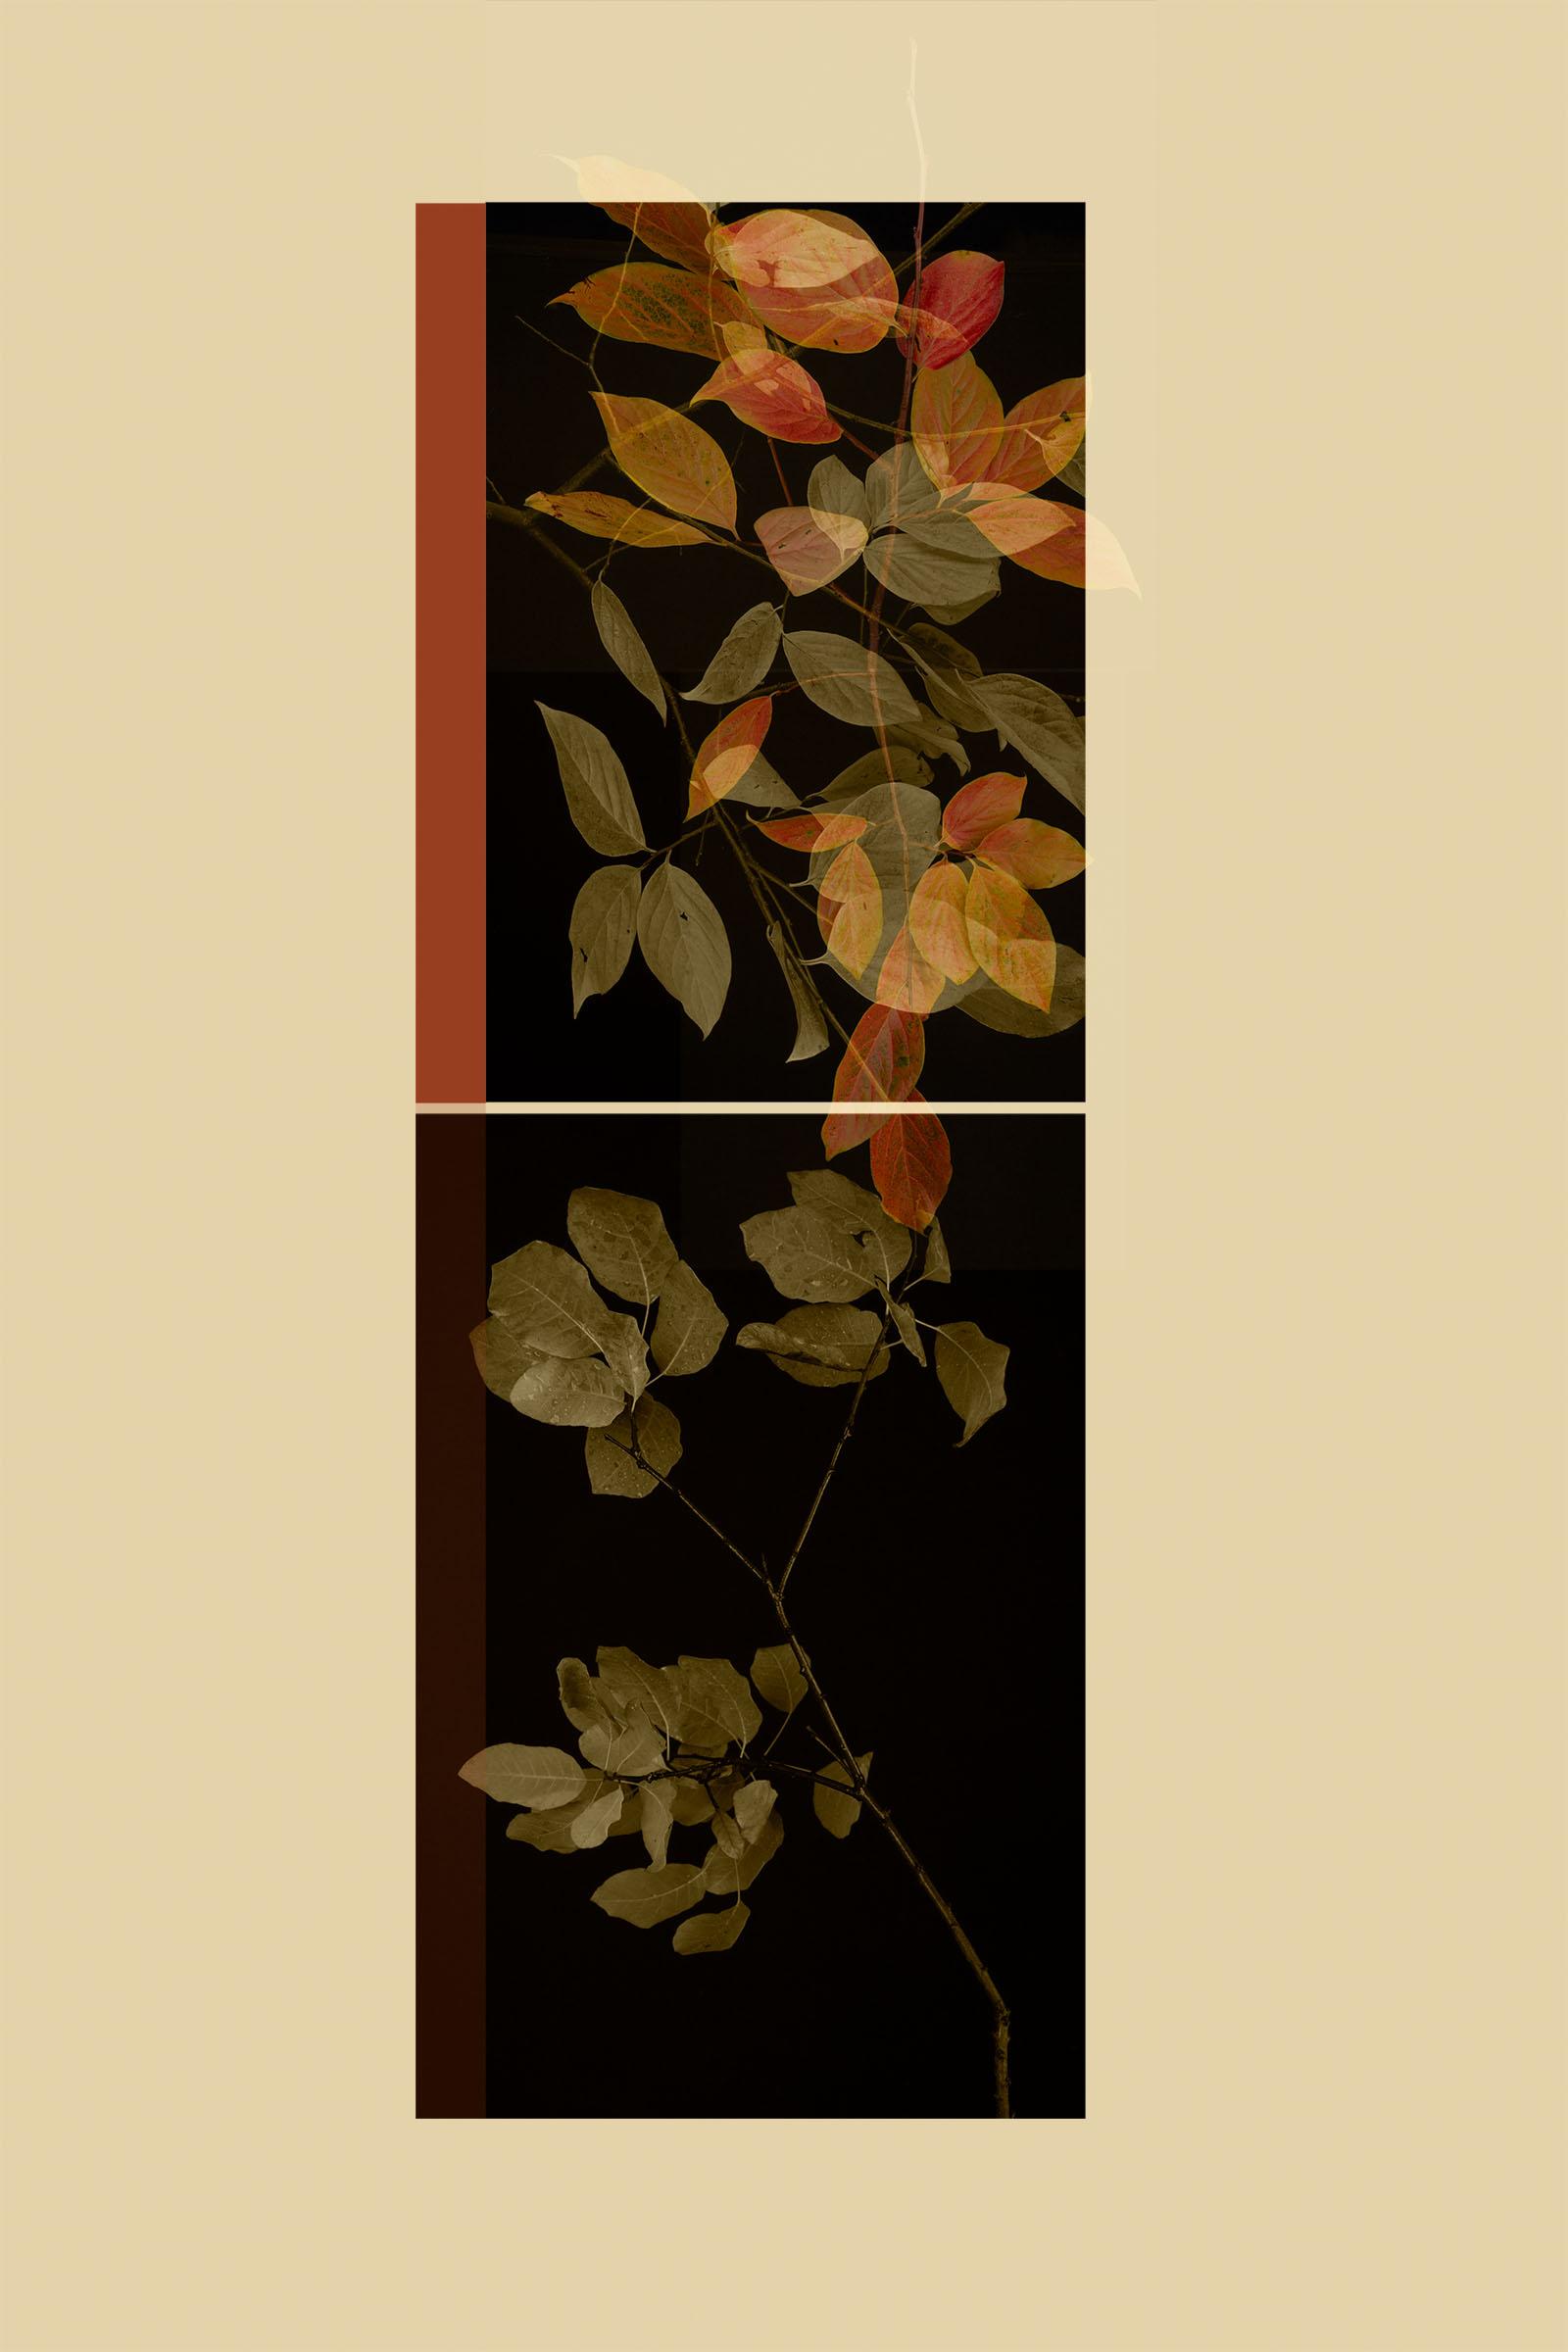 TEST - hanging plants0588-2.jpg